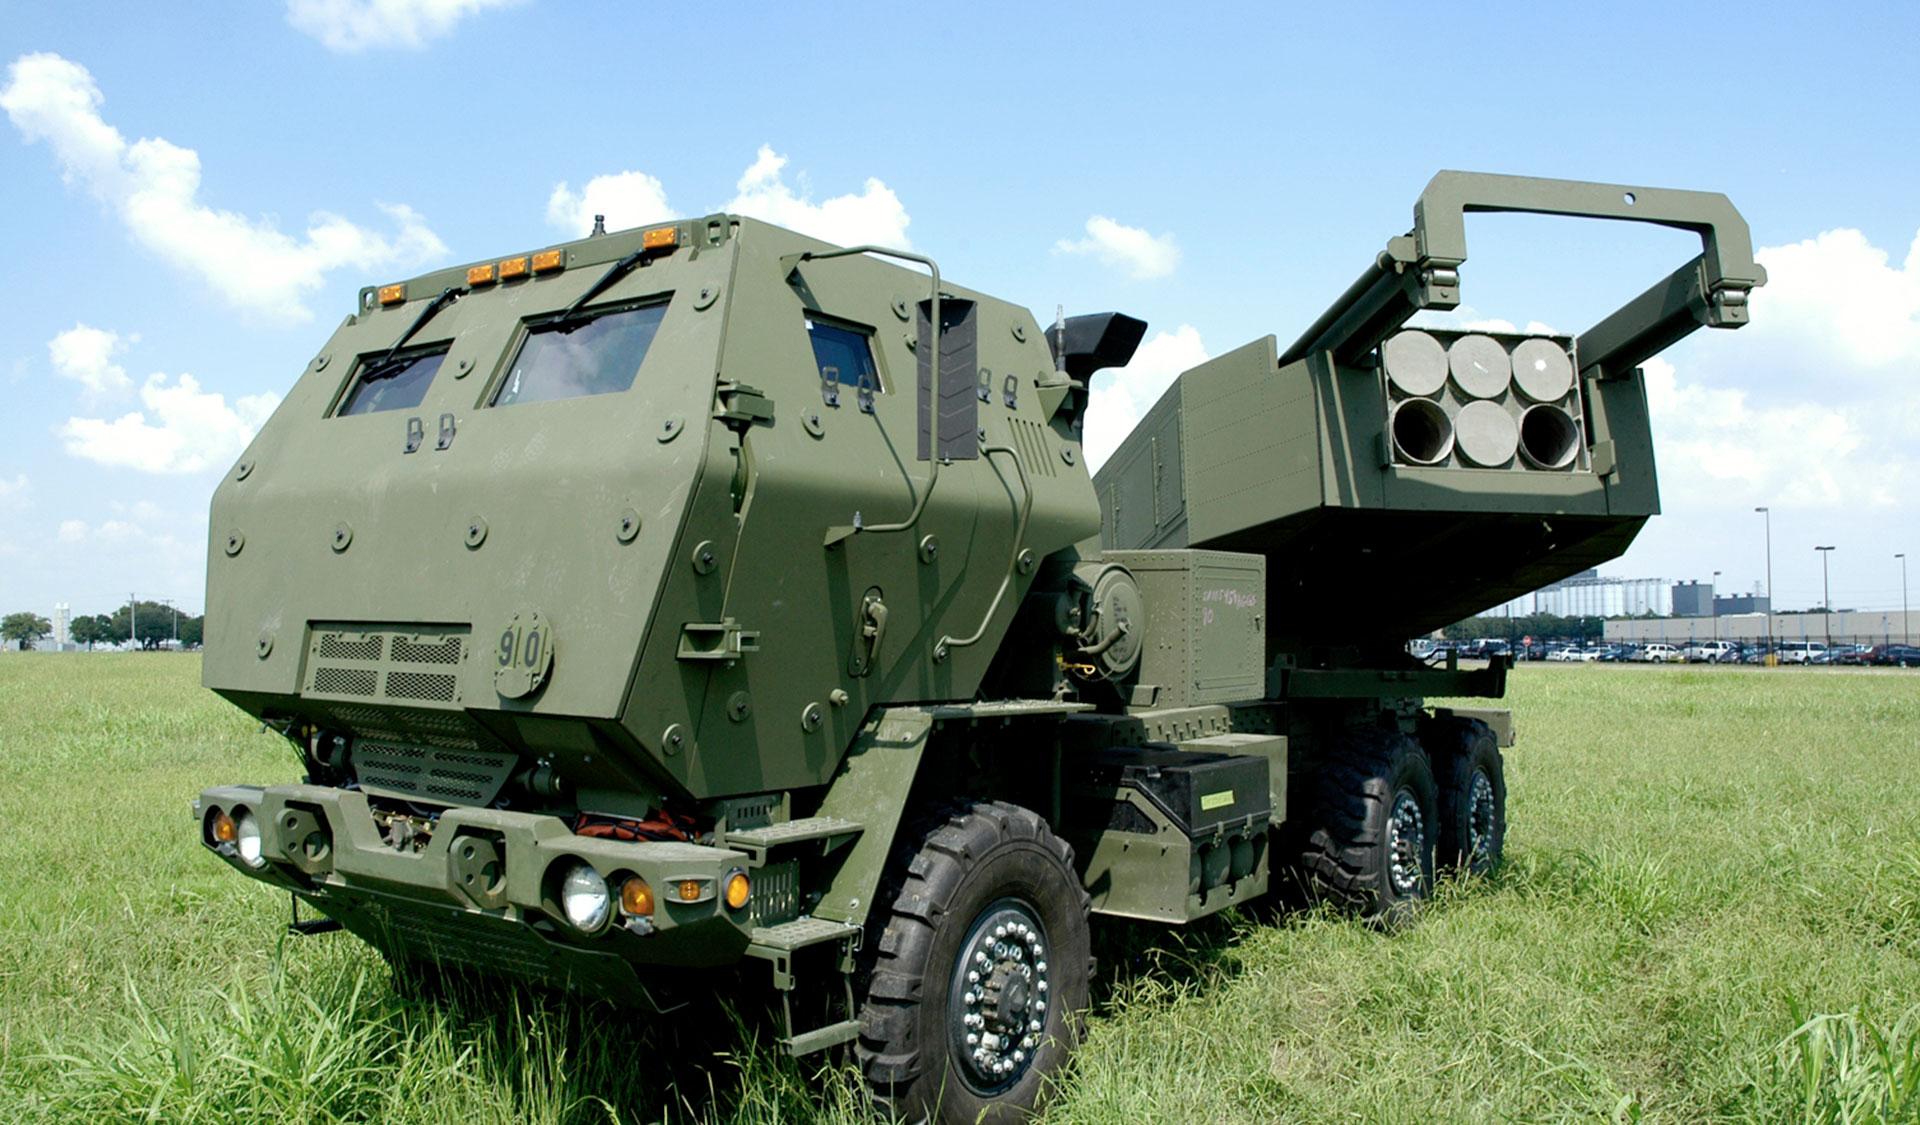 High Mobility Artillery Rocket System (HIMARS) | Lockheed Martin